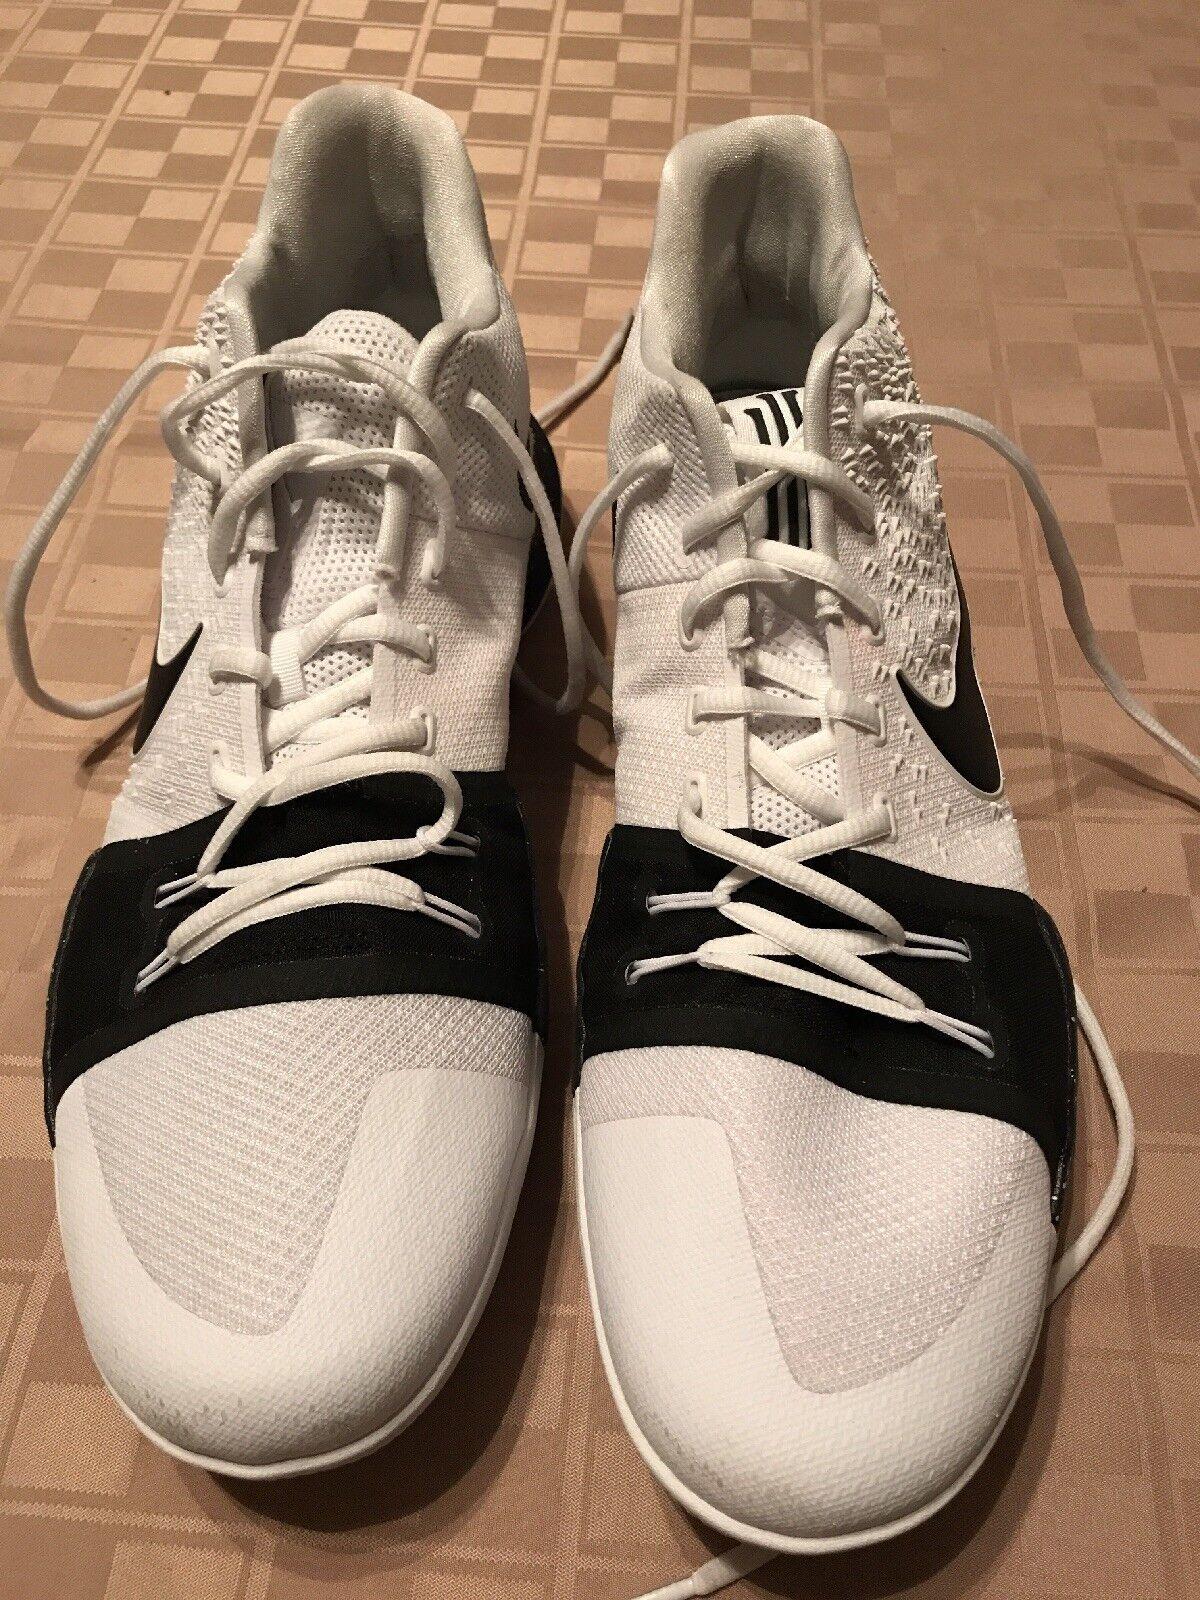 Uomo nike kyrie 3 scarpe da basket - bianco / nero taglia 14 917724-100